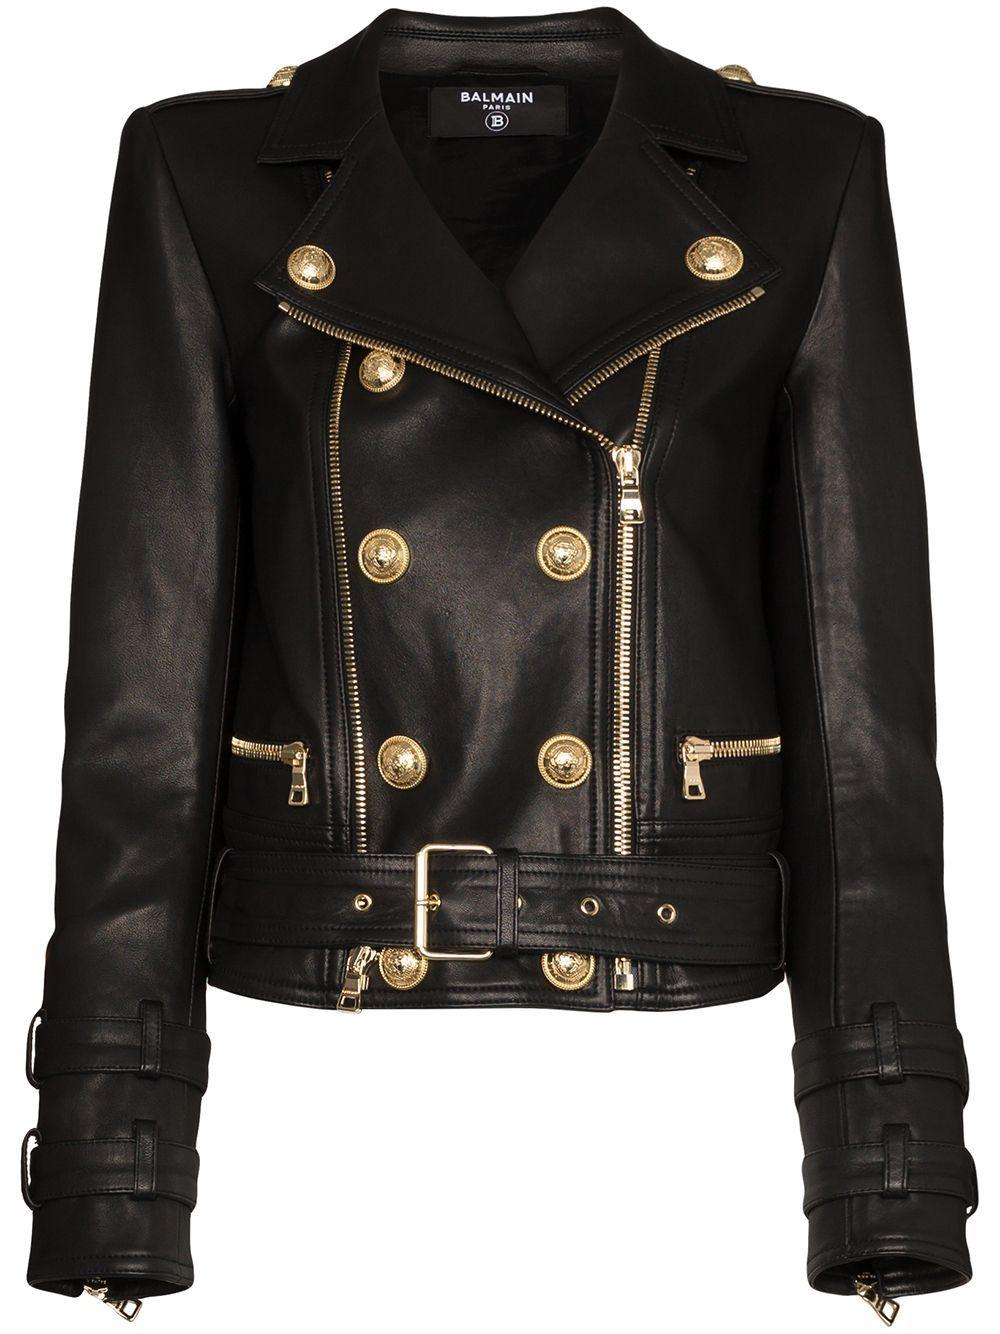 Balmain Women S Double Breasted Leather Biker Jacket In Black Modesens Balmain Leather Jacket Biker Jacket Leather Jacket Black [ 1334 x 1000 Pixel ]